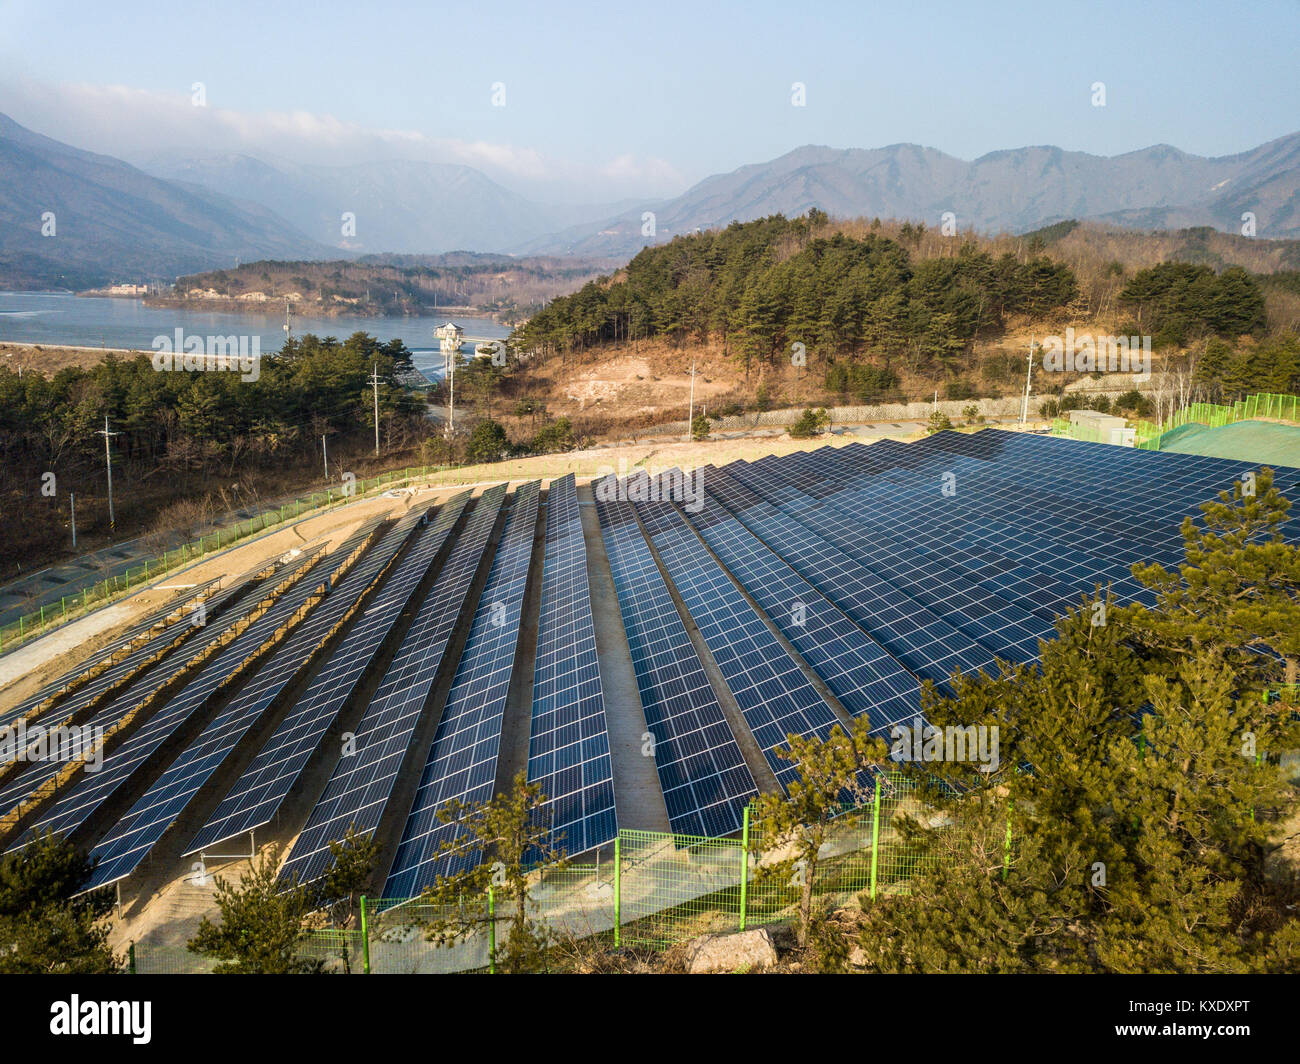 Solar panels in rural eastern South Korea - Stock Image